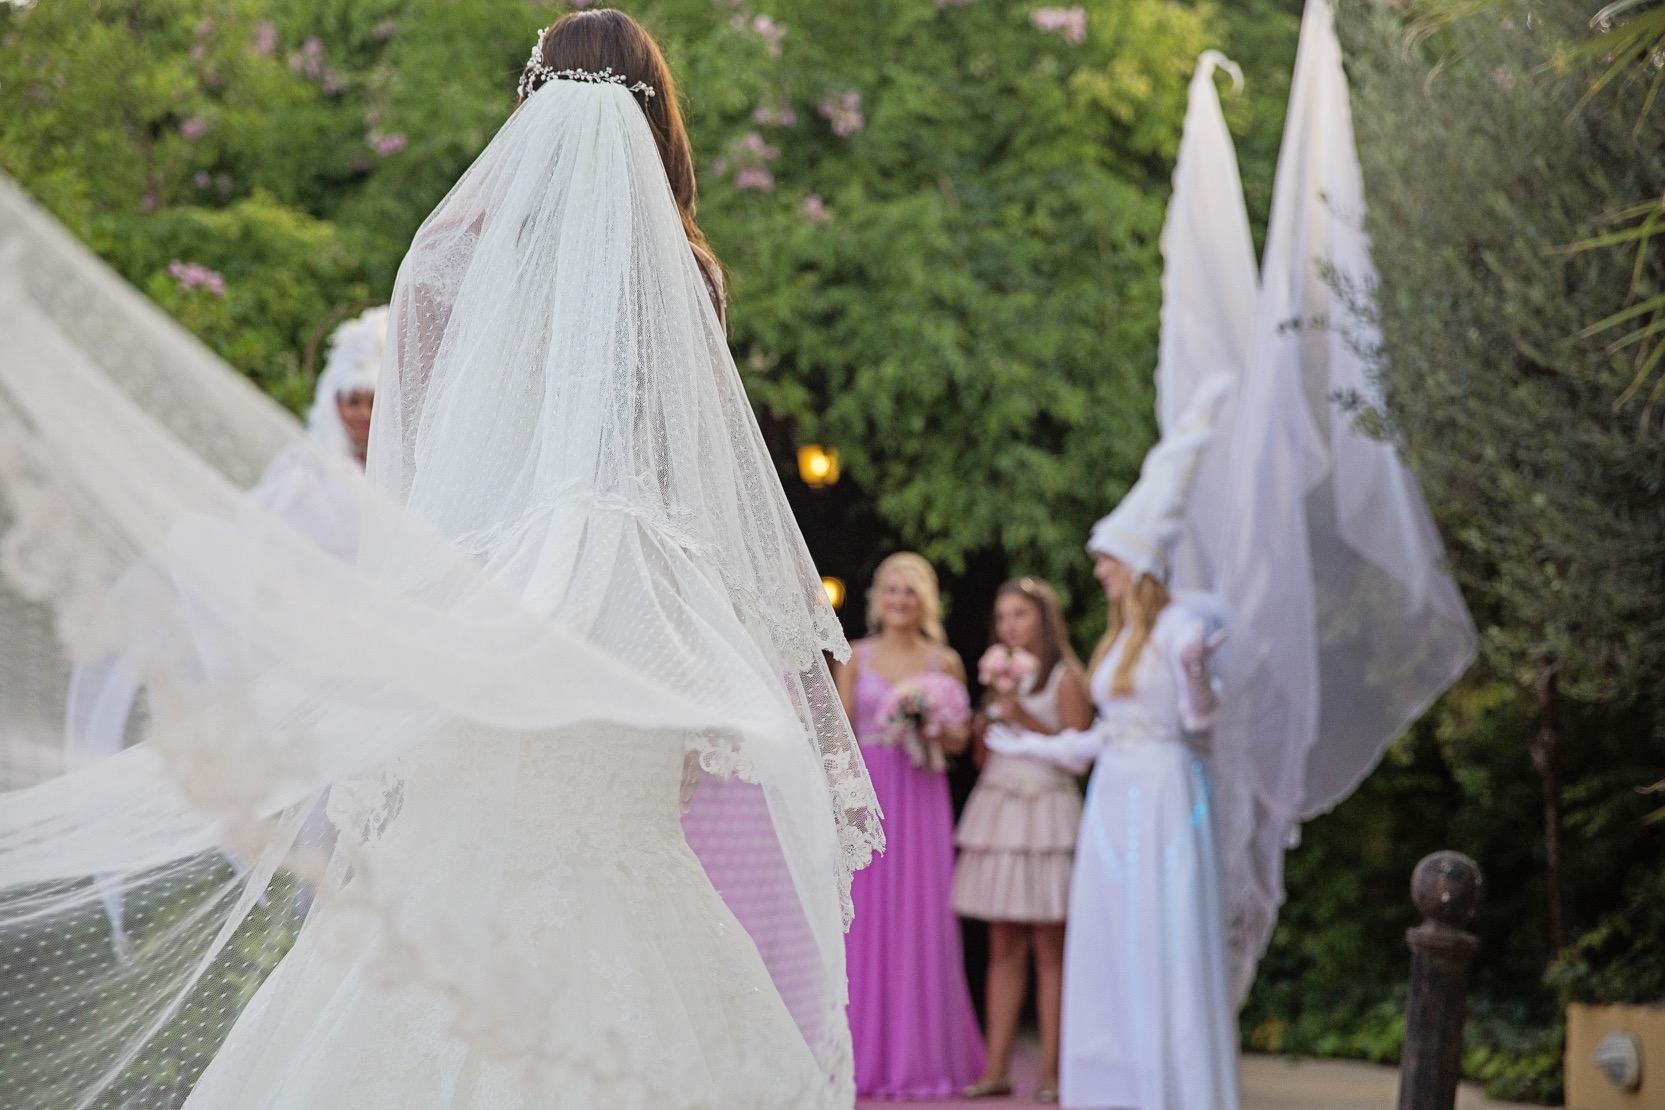 Si-Quiero-Wedding-Planner-By-Sira-Antequera-Bodas-Málaga-Marbella-Miami Natalia-Jaime-3